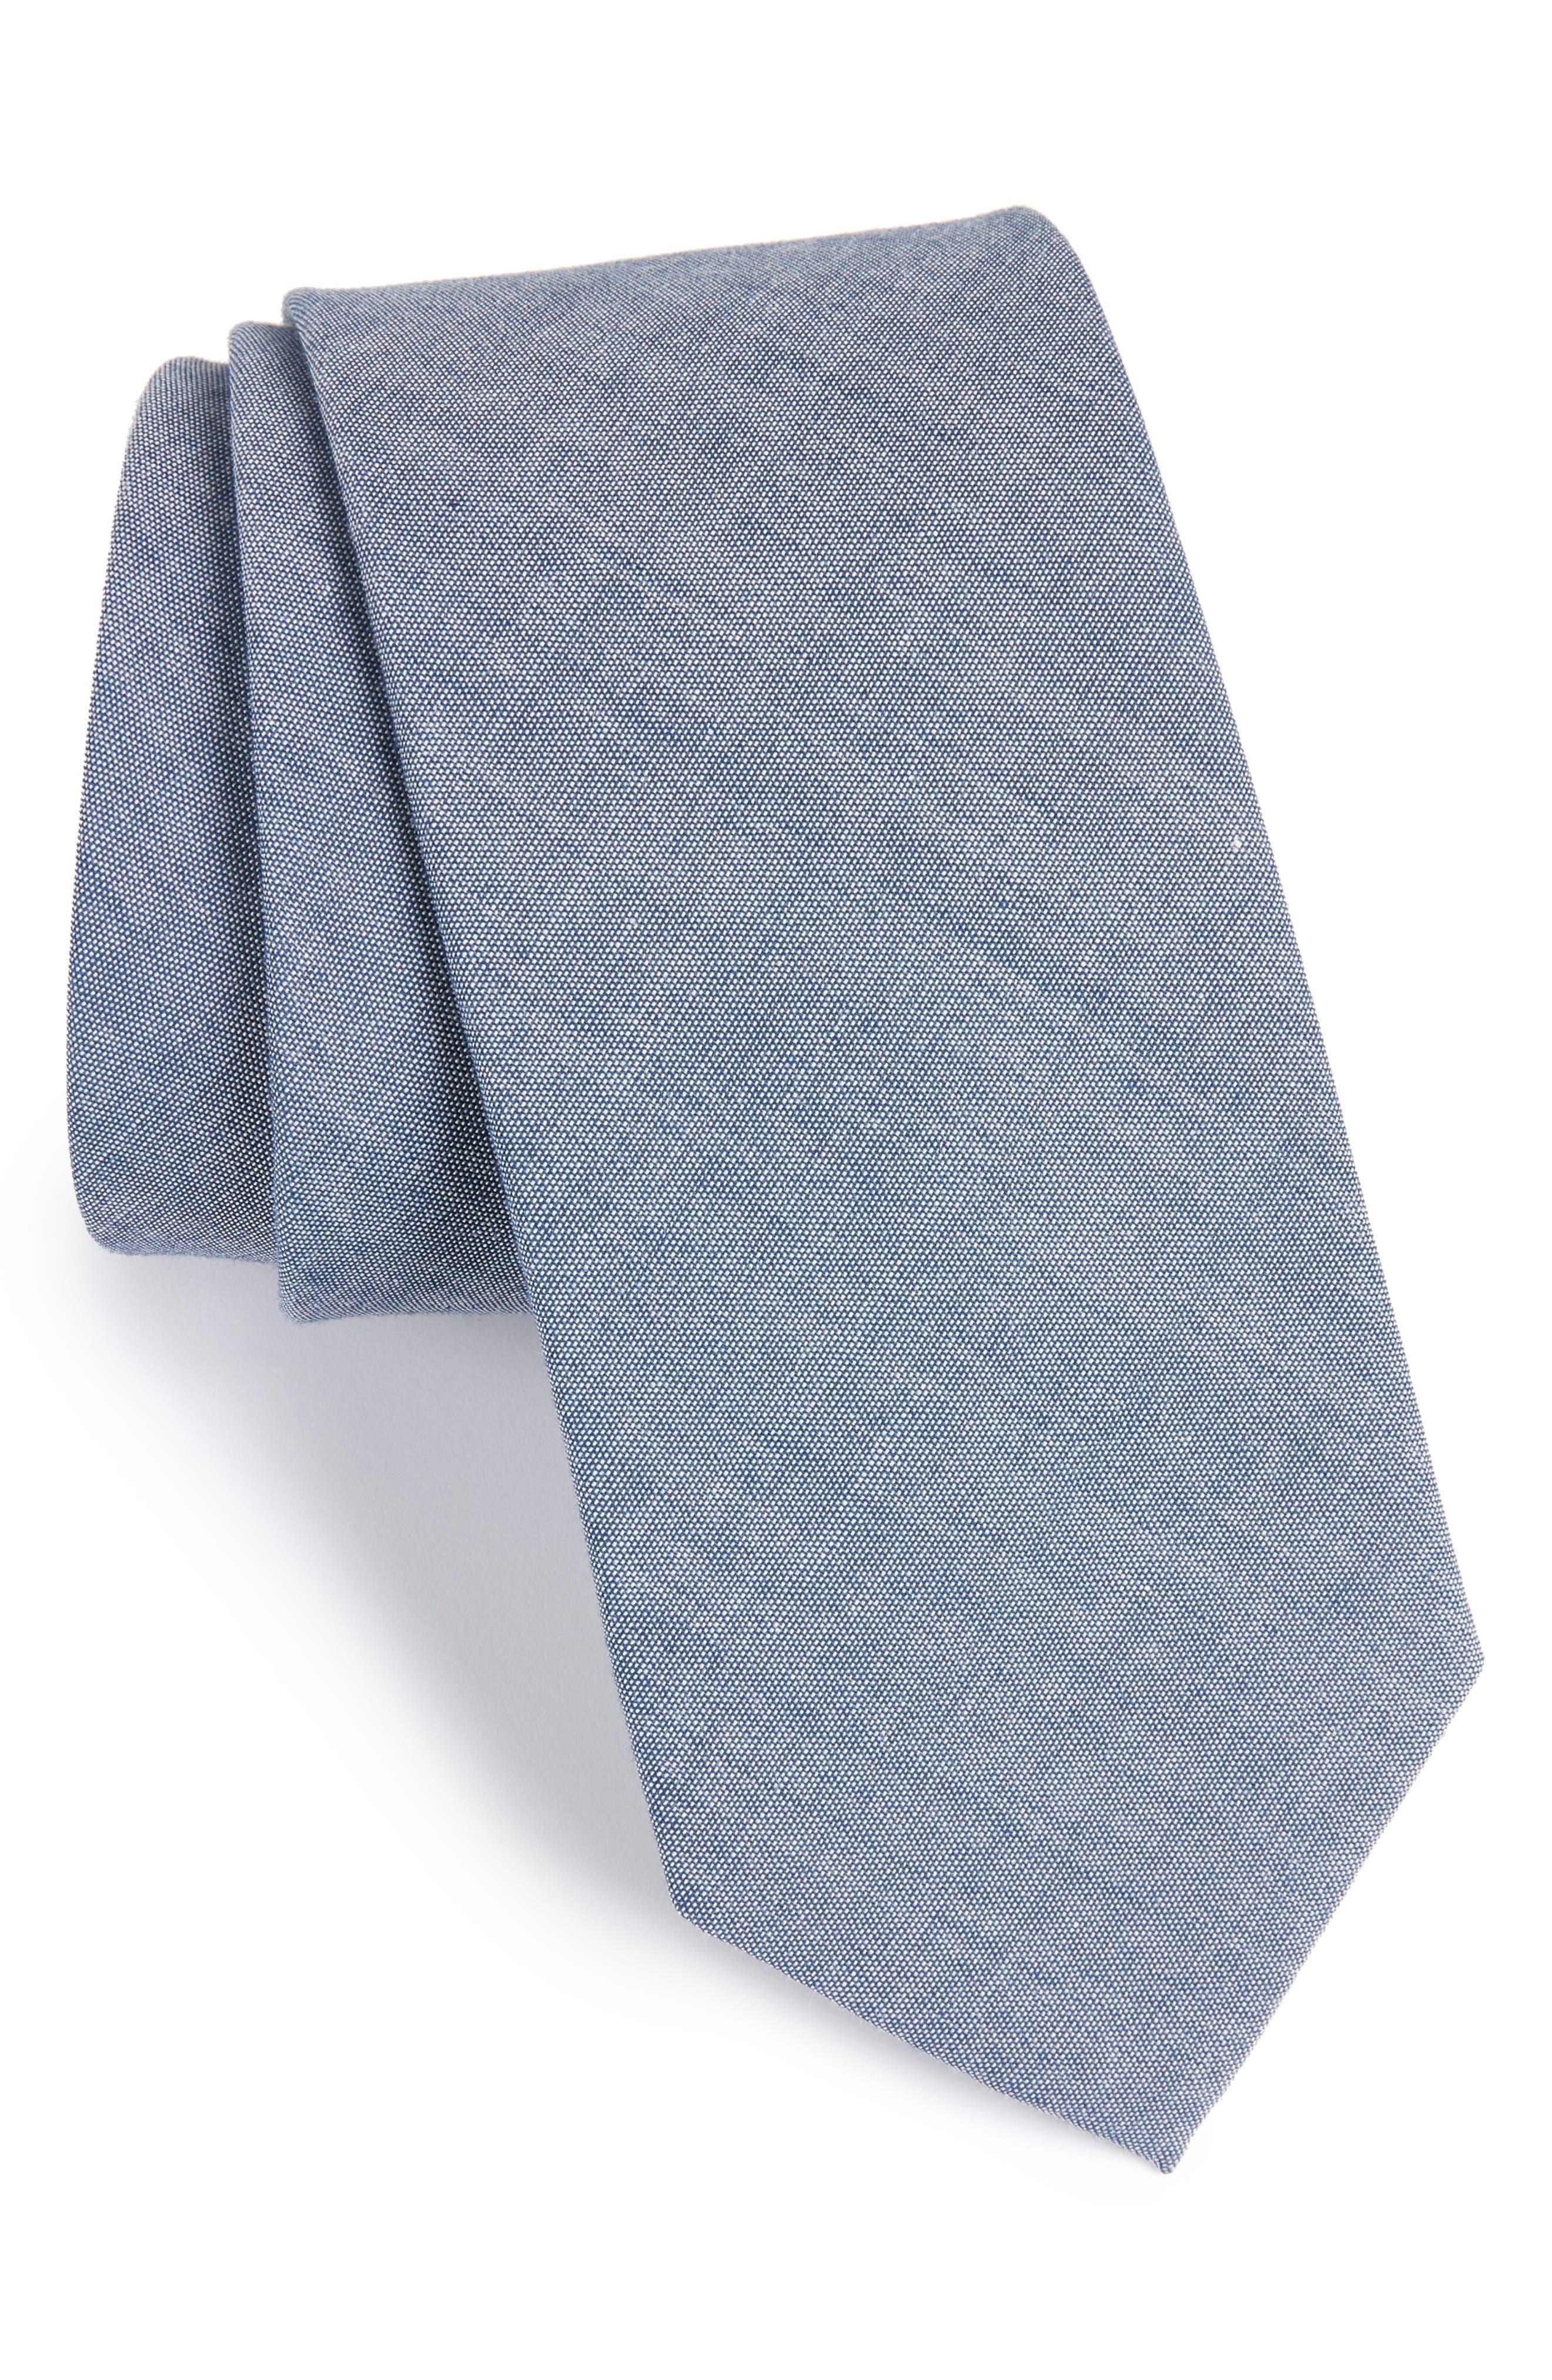 Classic Chambray Cotton Tie,                         Main,                         color, Warm Blue